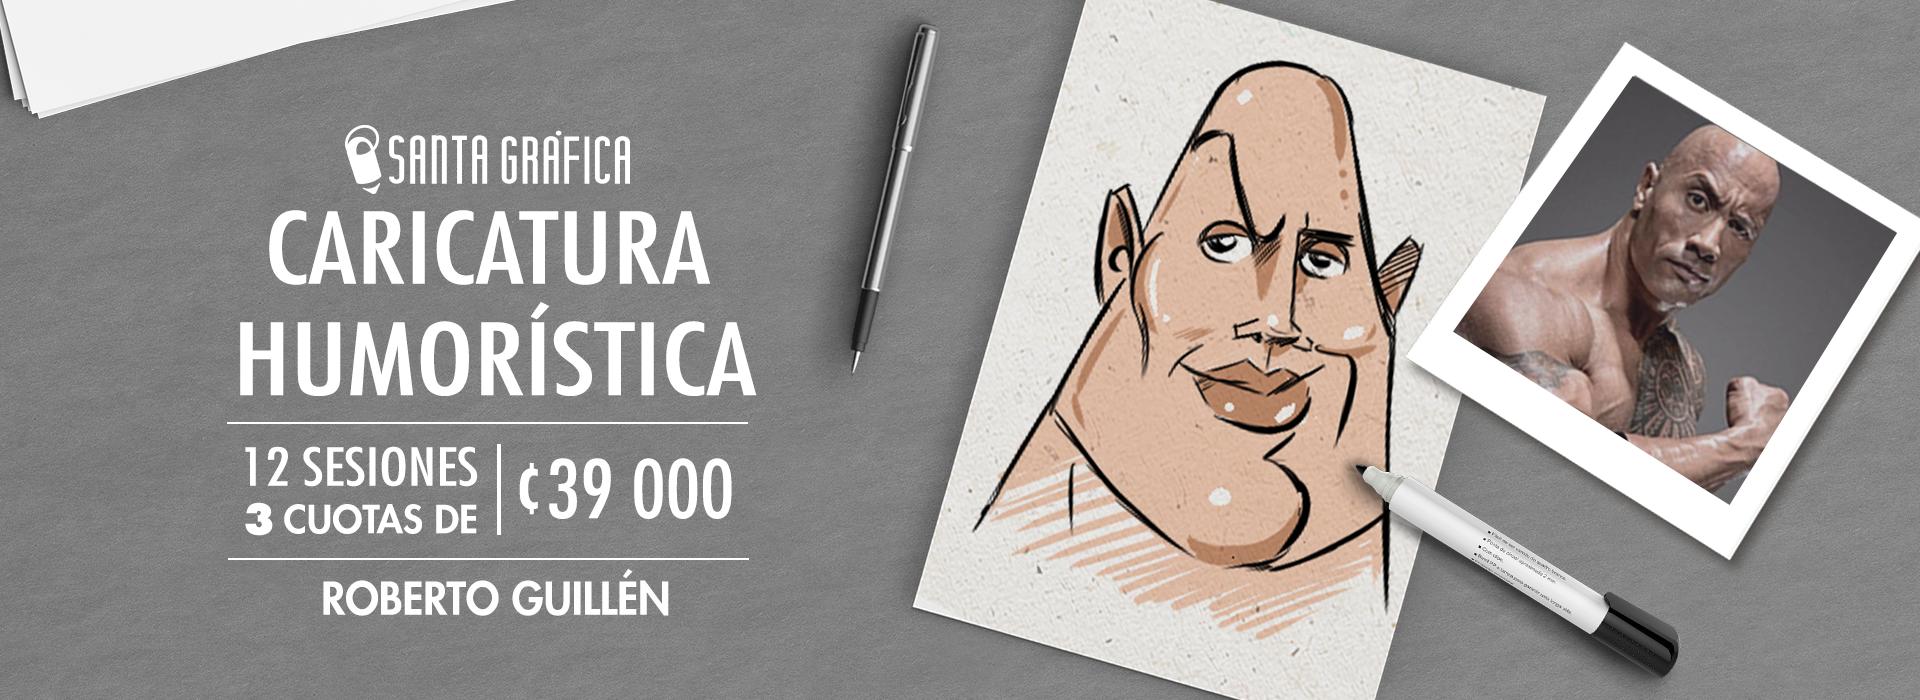 PORTADA-WEB-CARICATURA